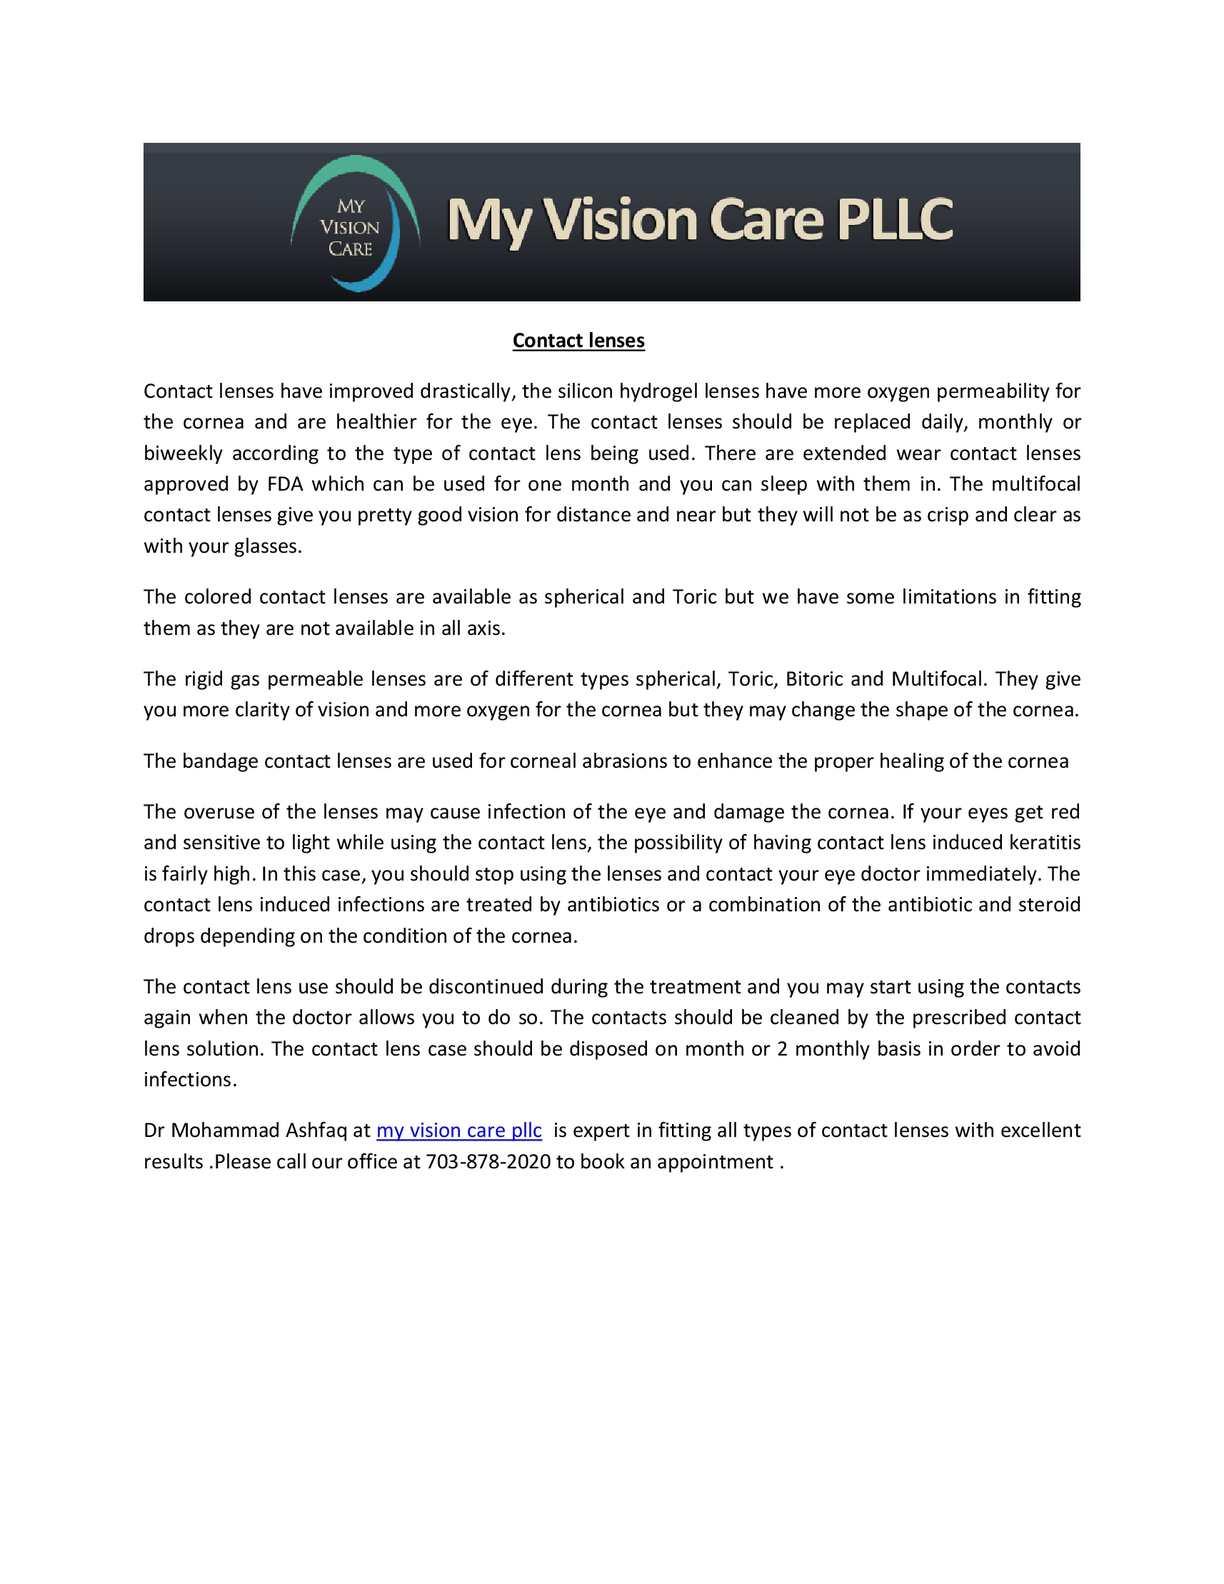 Best Multifocal Contact Lenses 2020.Calameo Contact Lenses